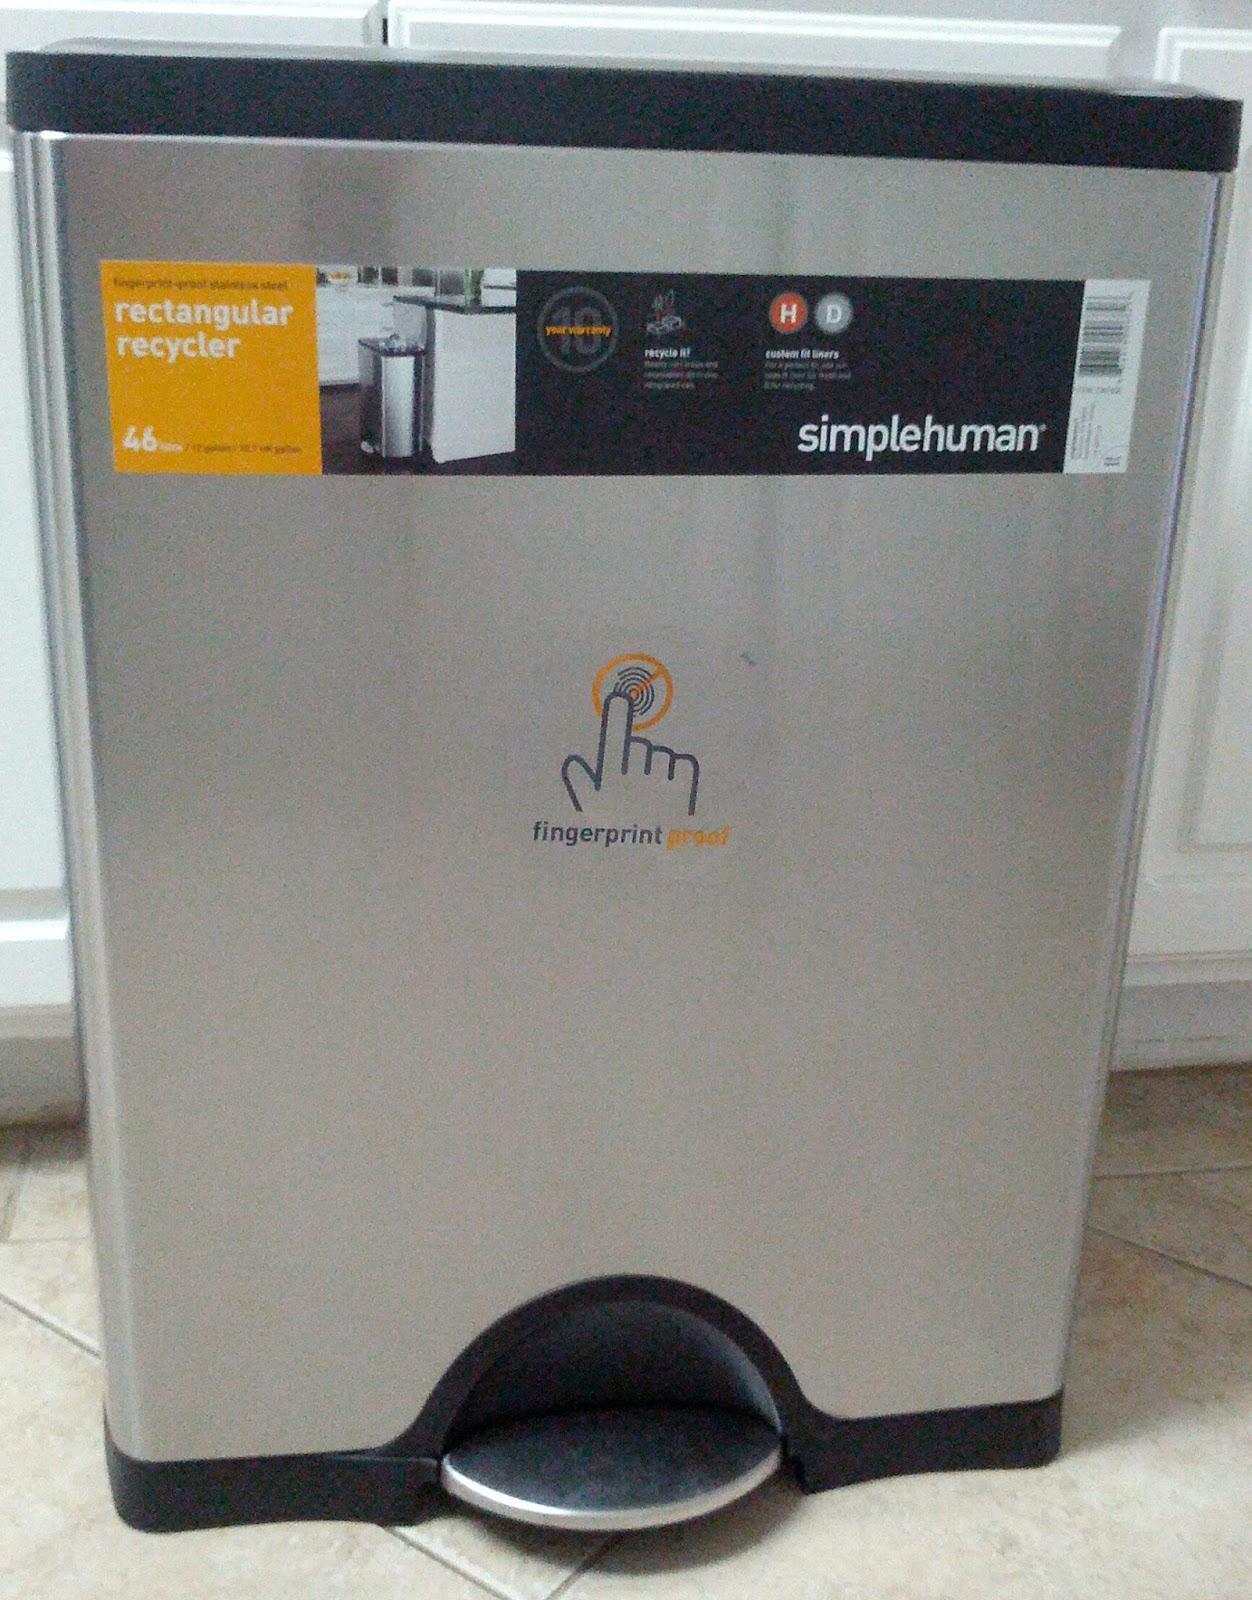 Simplehuman Recycler | Simply Human Trash Can | Simplehuman Trash Bags